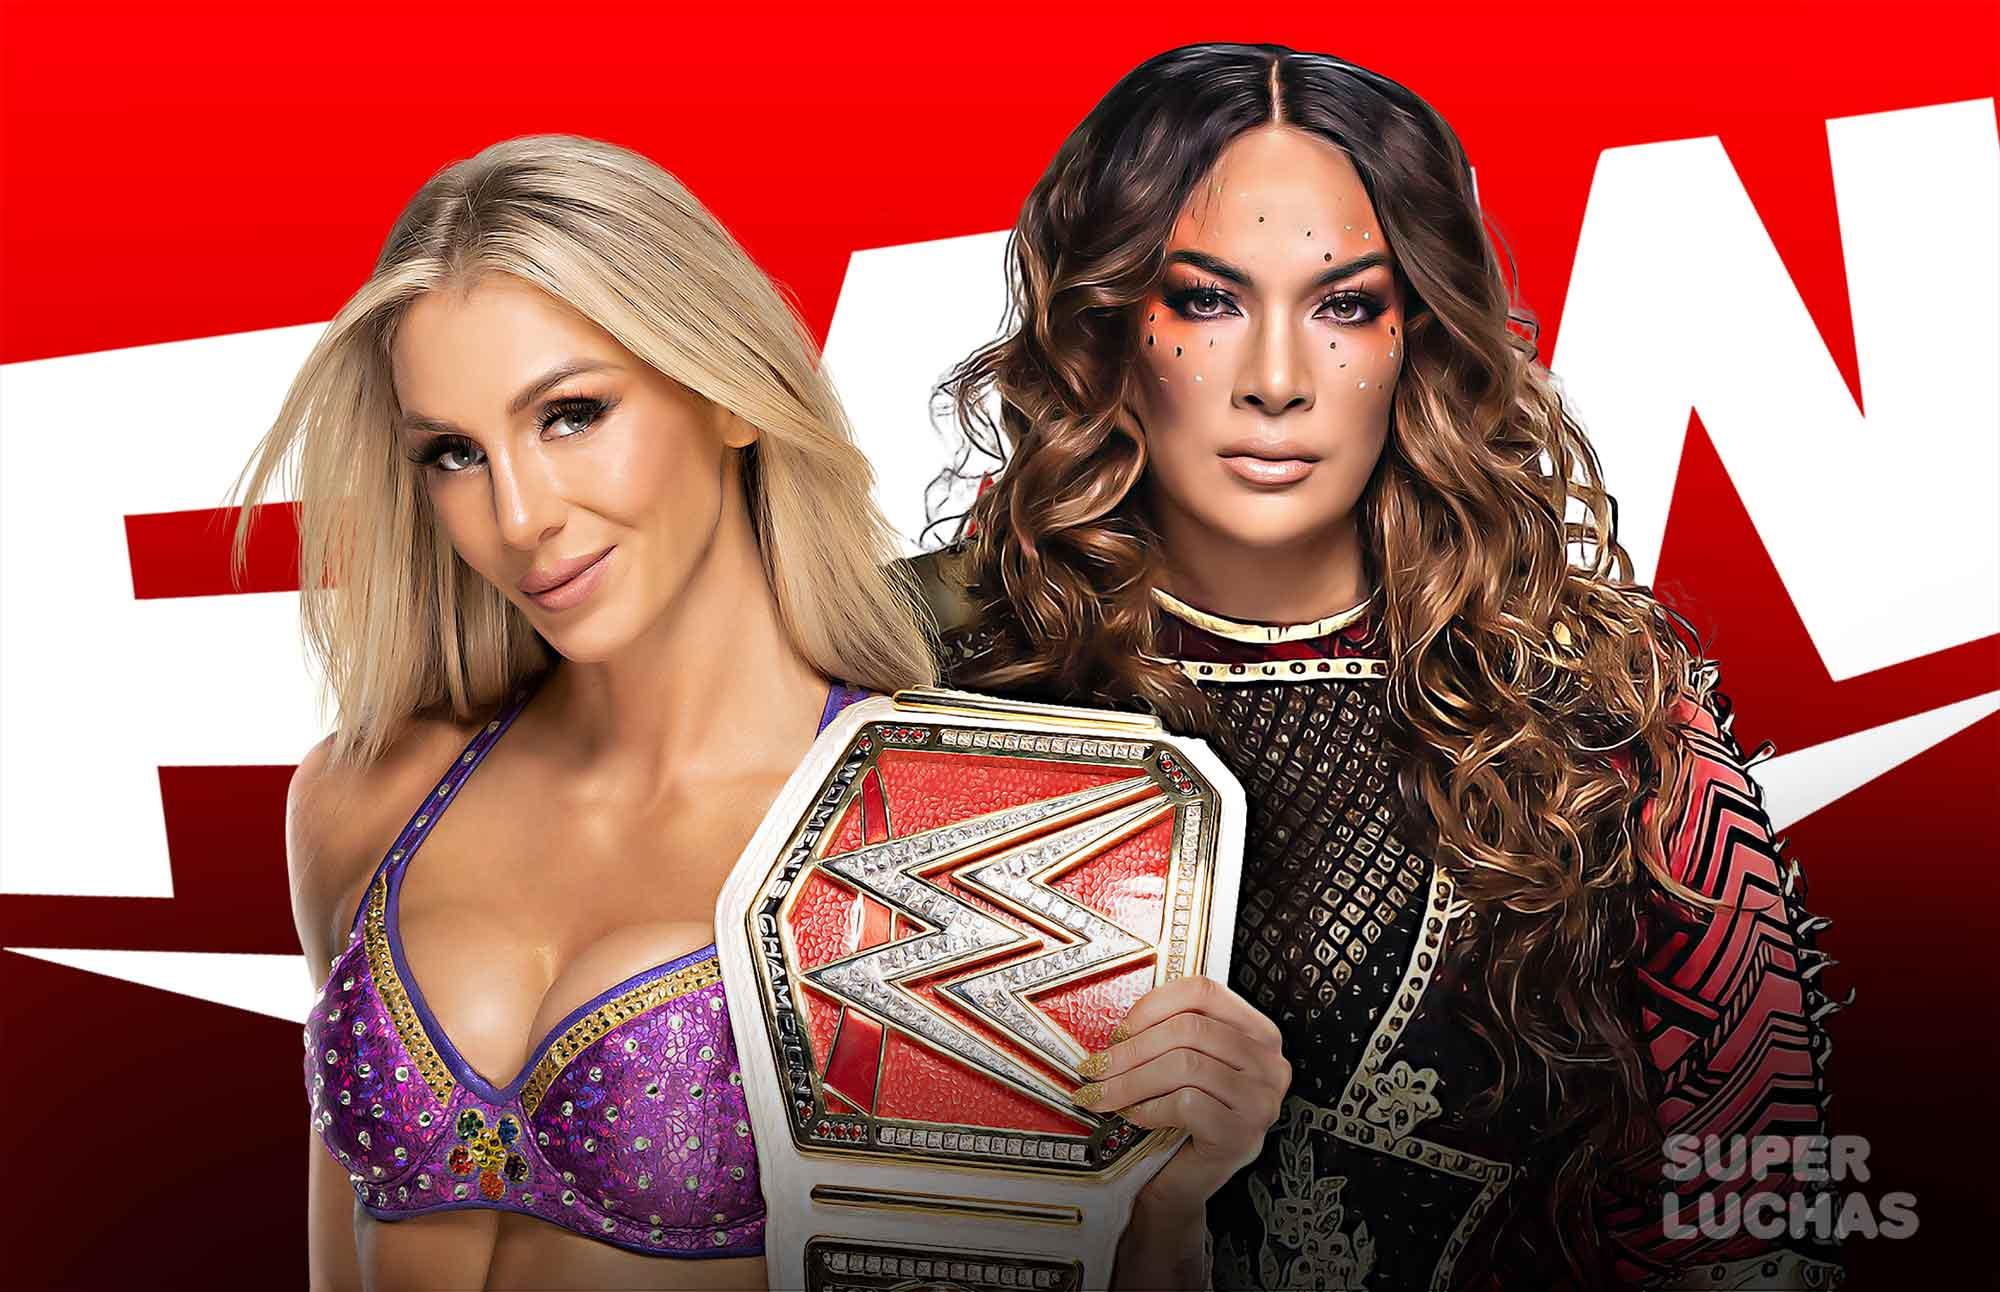 Previous WWE Raw September 6, 2021 I Charlotte Flair vs. Nia jax